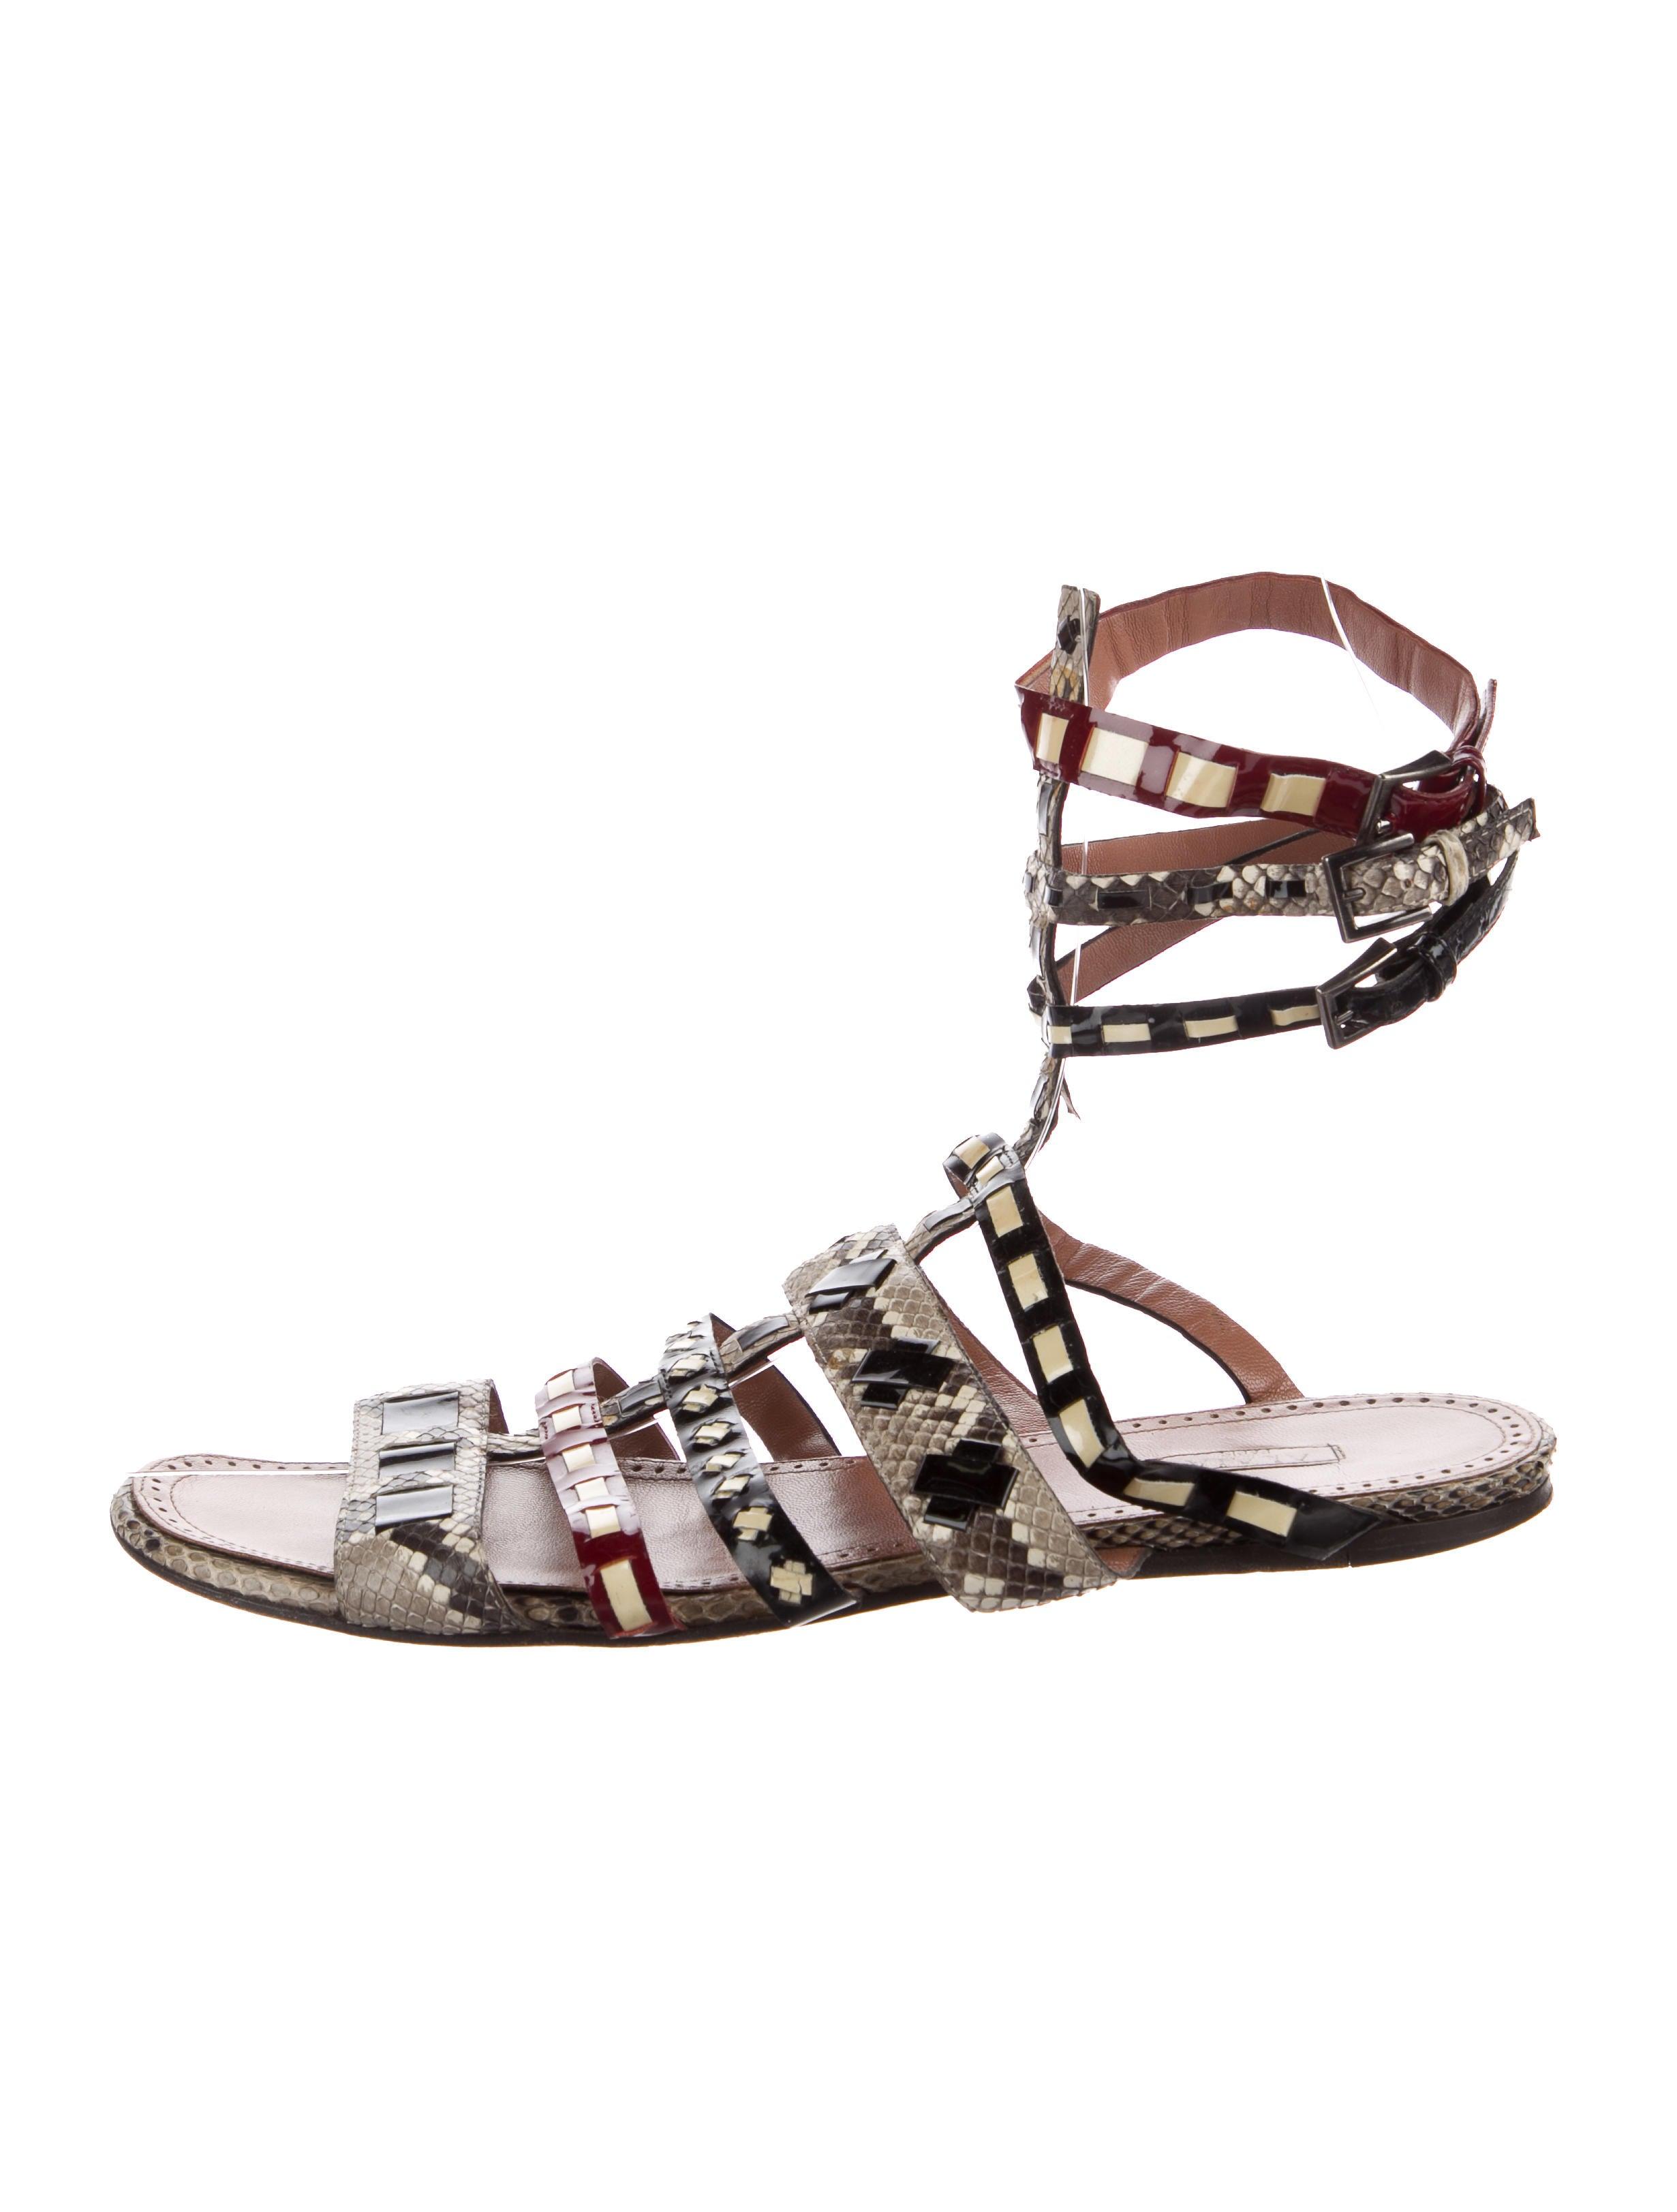 Alaïa Snakeskin Gladiator Sandals free shipping original buy cheap professional oNeeUYRosW